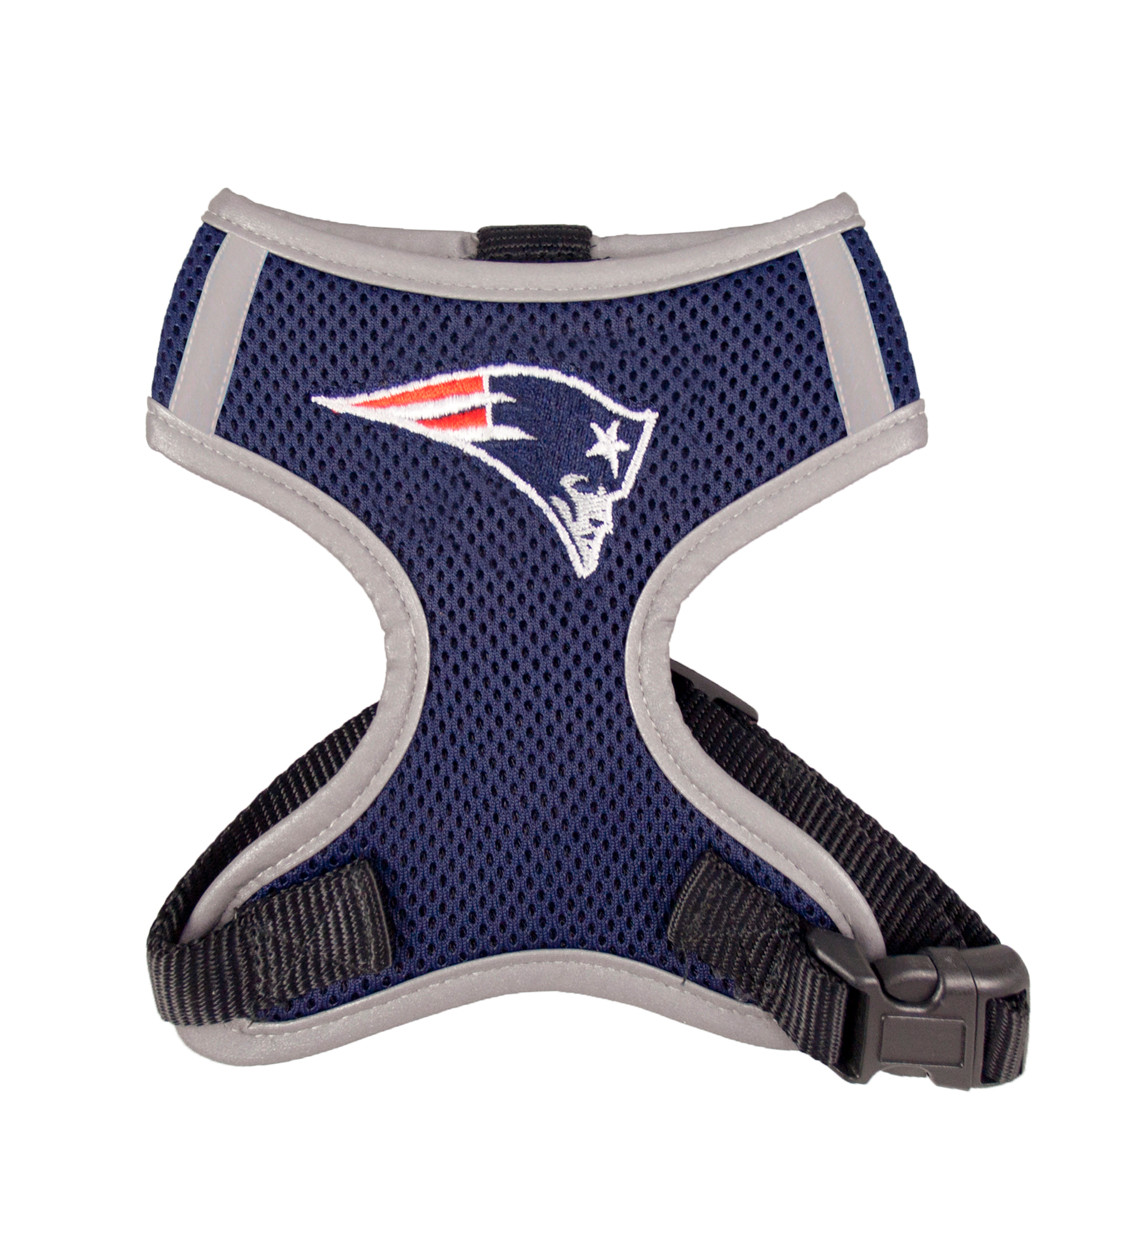 7e89d724 New England Patriots Dog Harness Vest